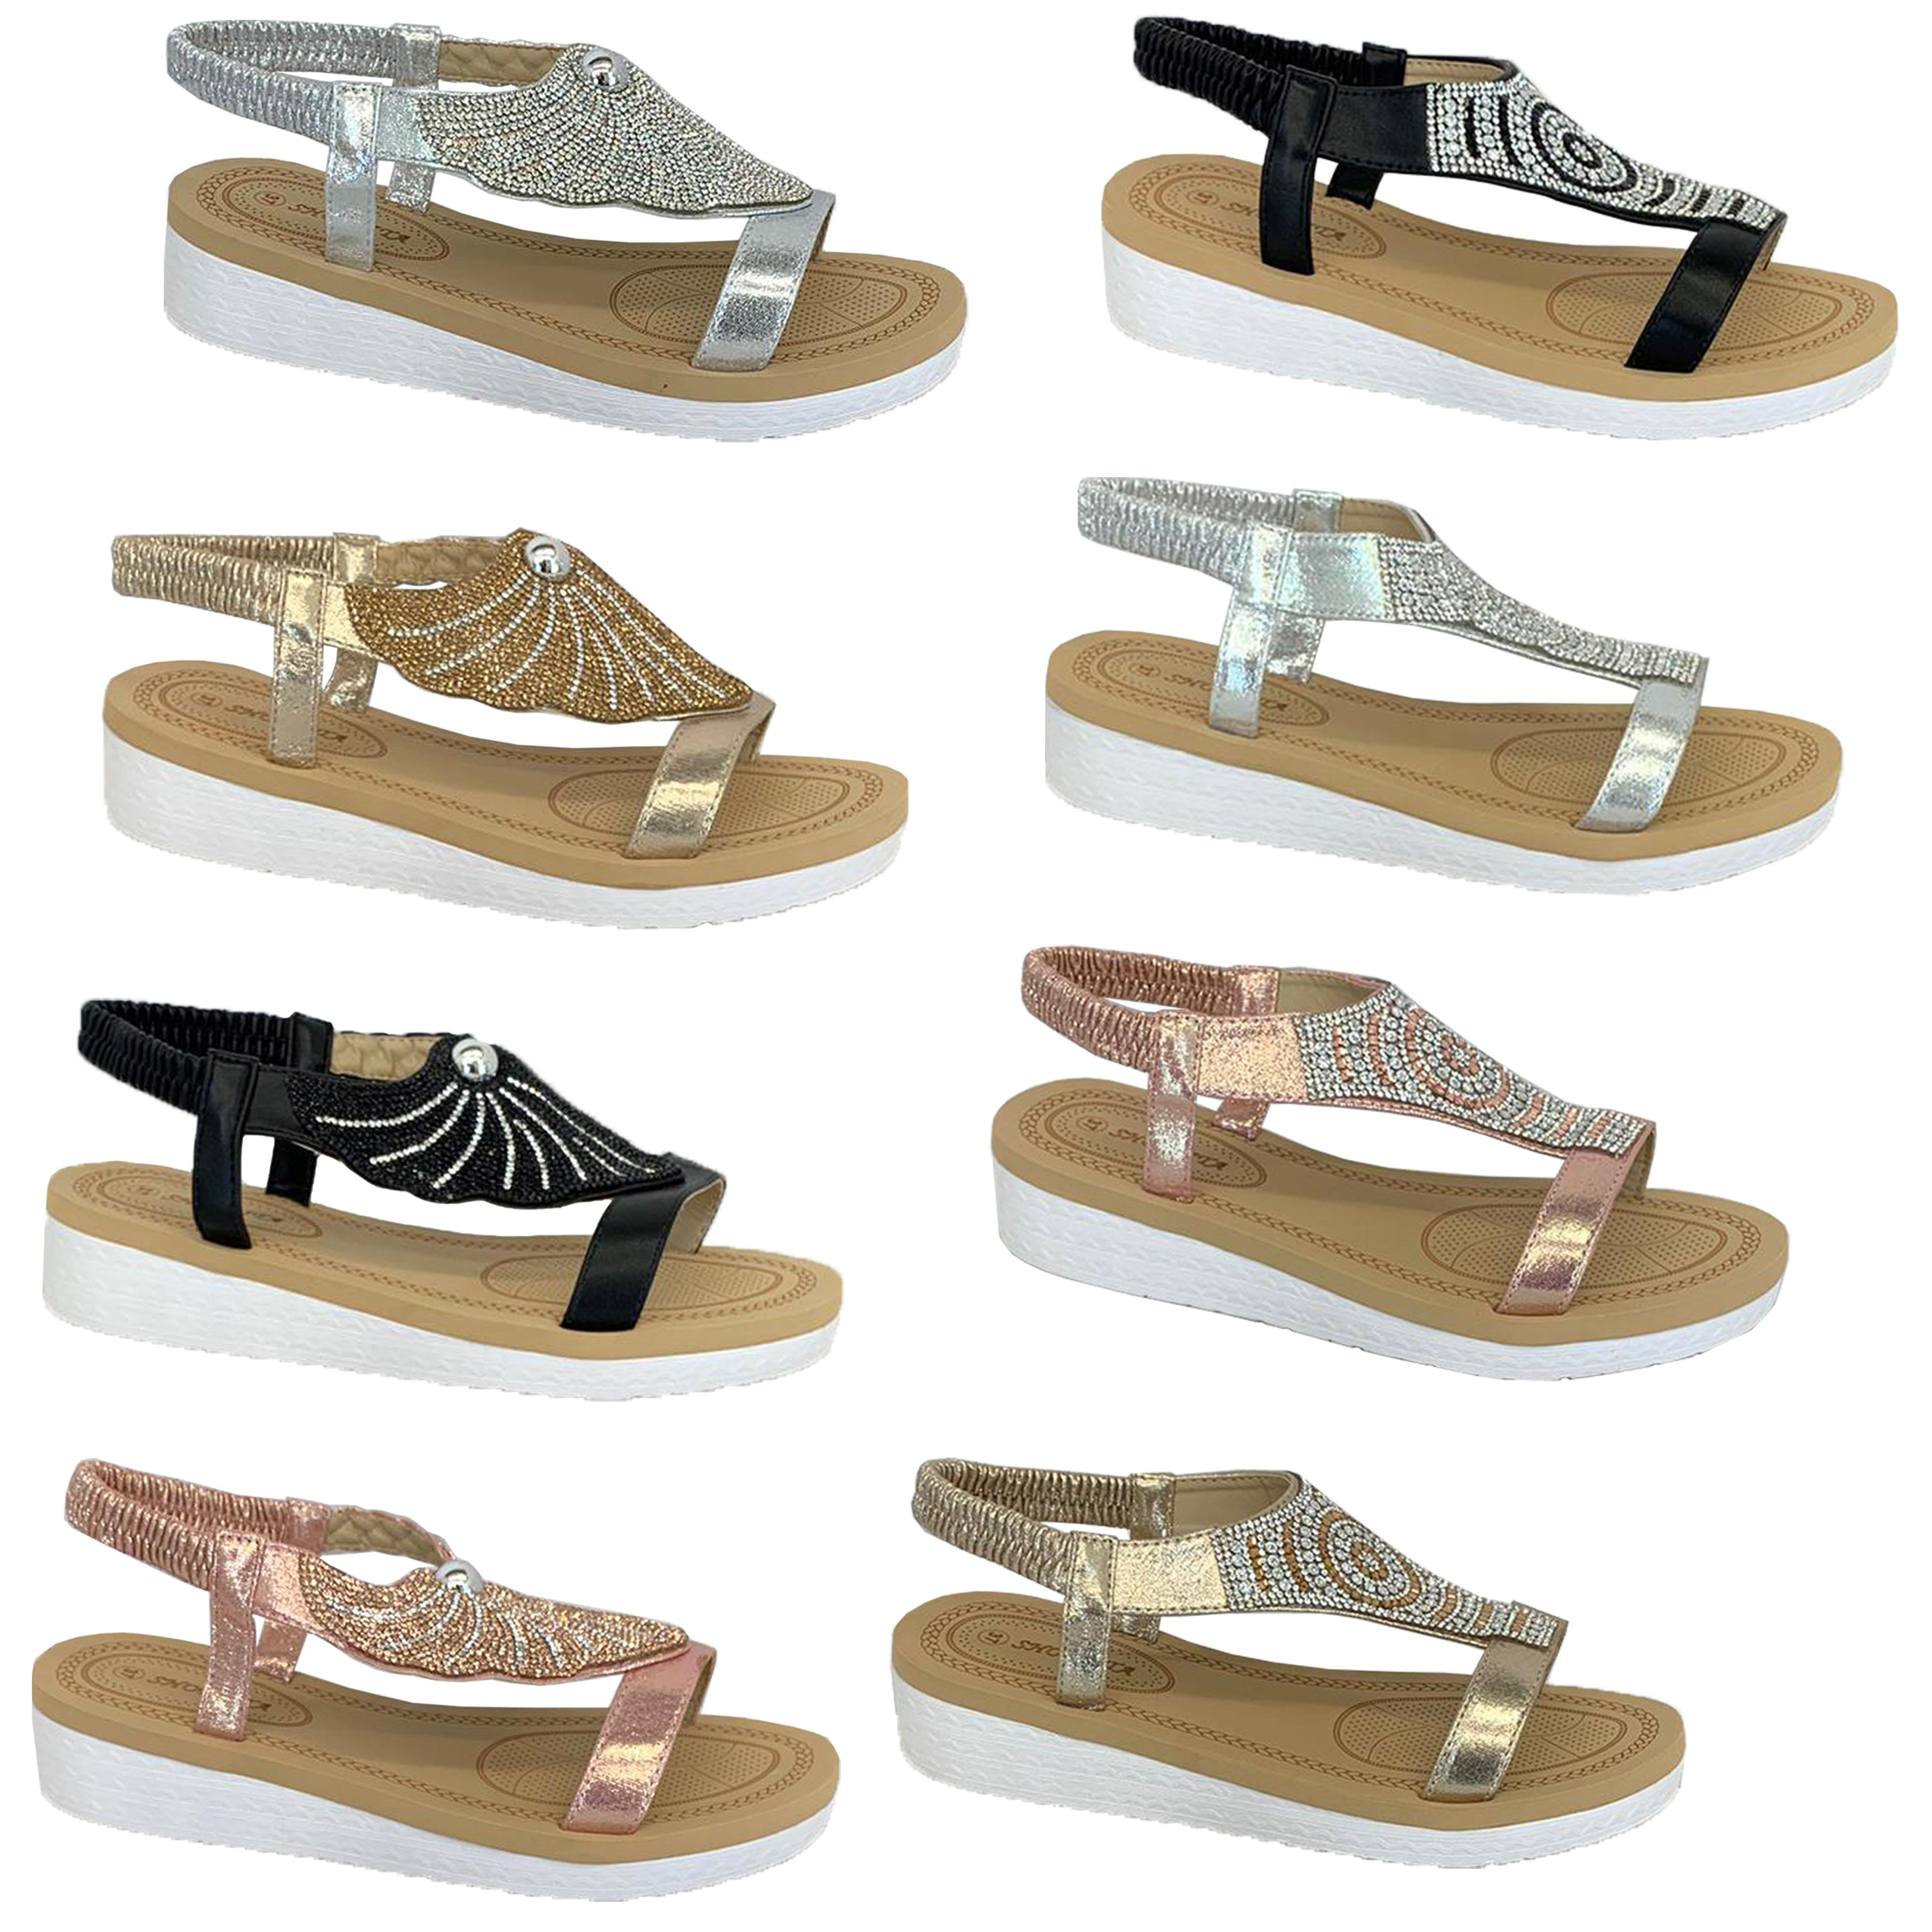 Ladies-Sandals-Womens-Diamante-Sling-Back-Open-Toe-Shoes-Fashion-Summer-New thumbnail 3